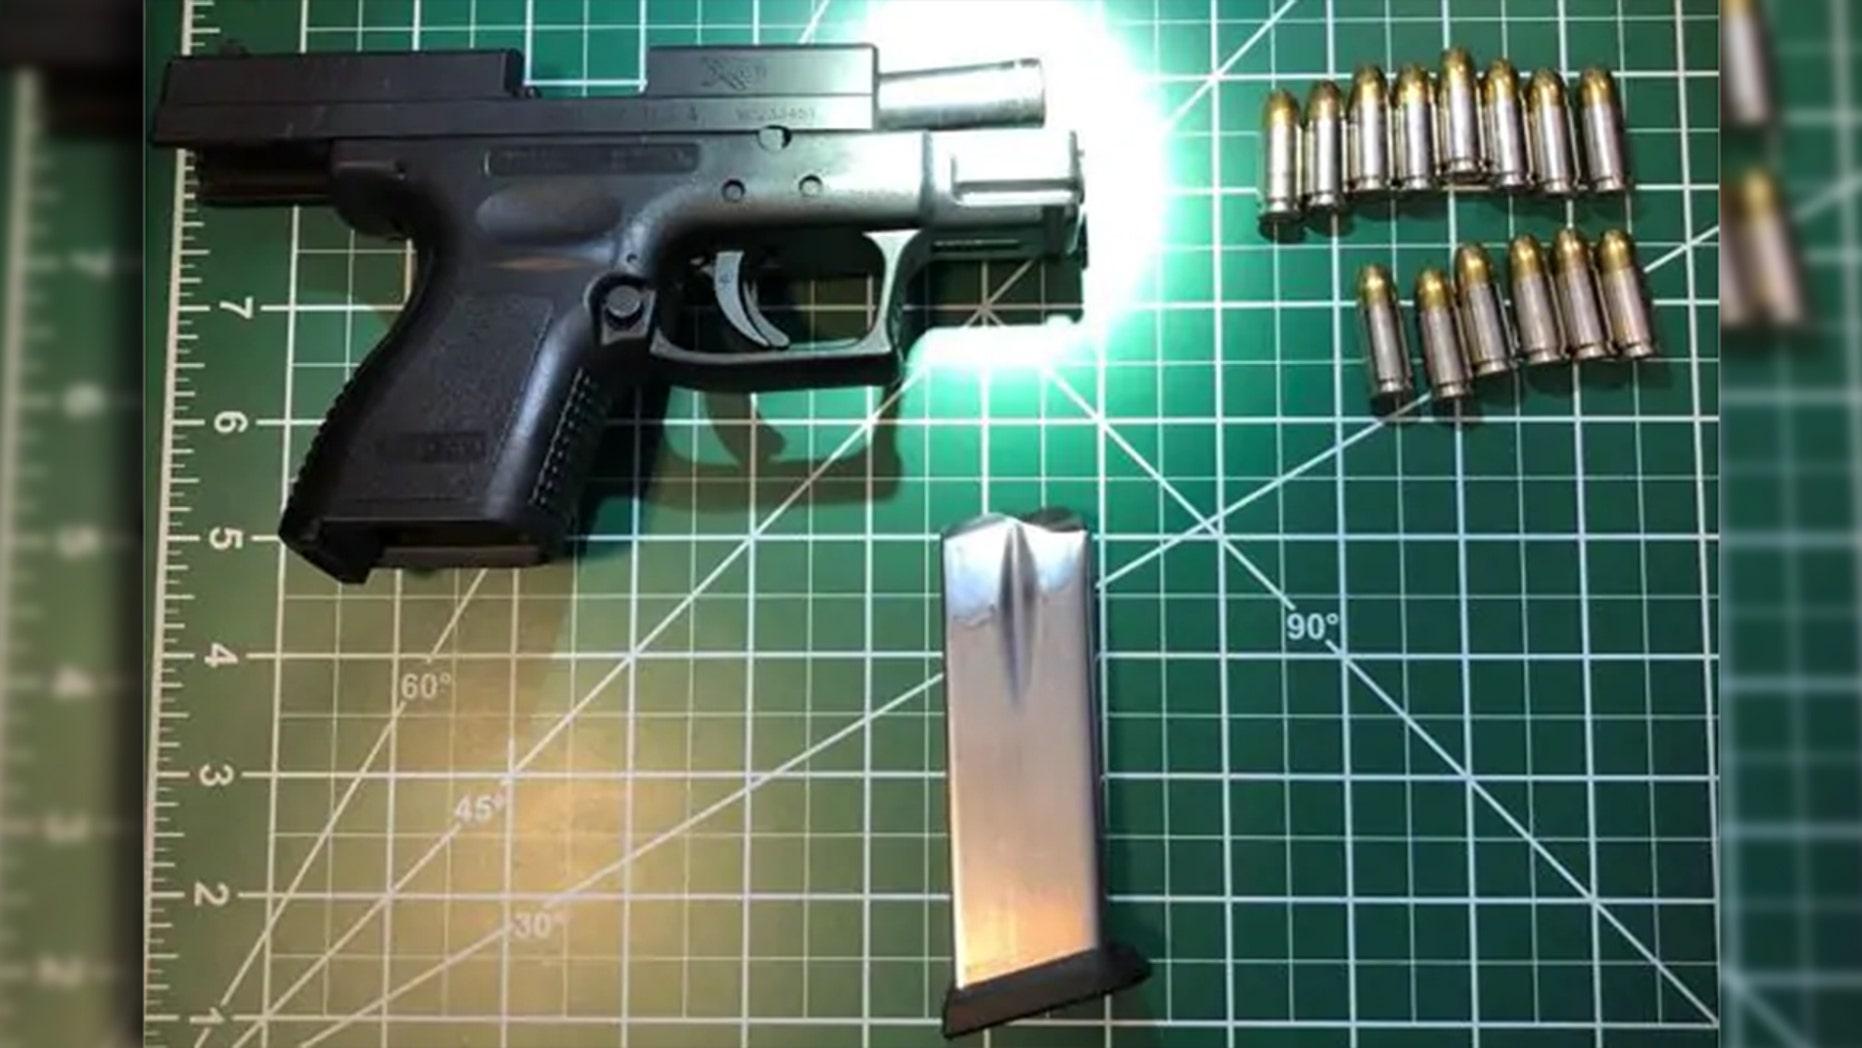 TSA screeners detected this loaded 9 mm handgun at a Reagan Airport checkpoint Oct. 16.